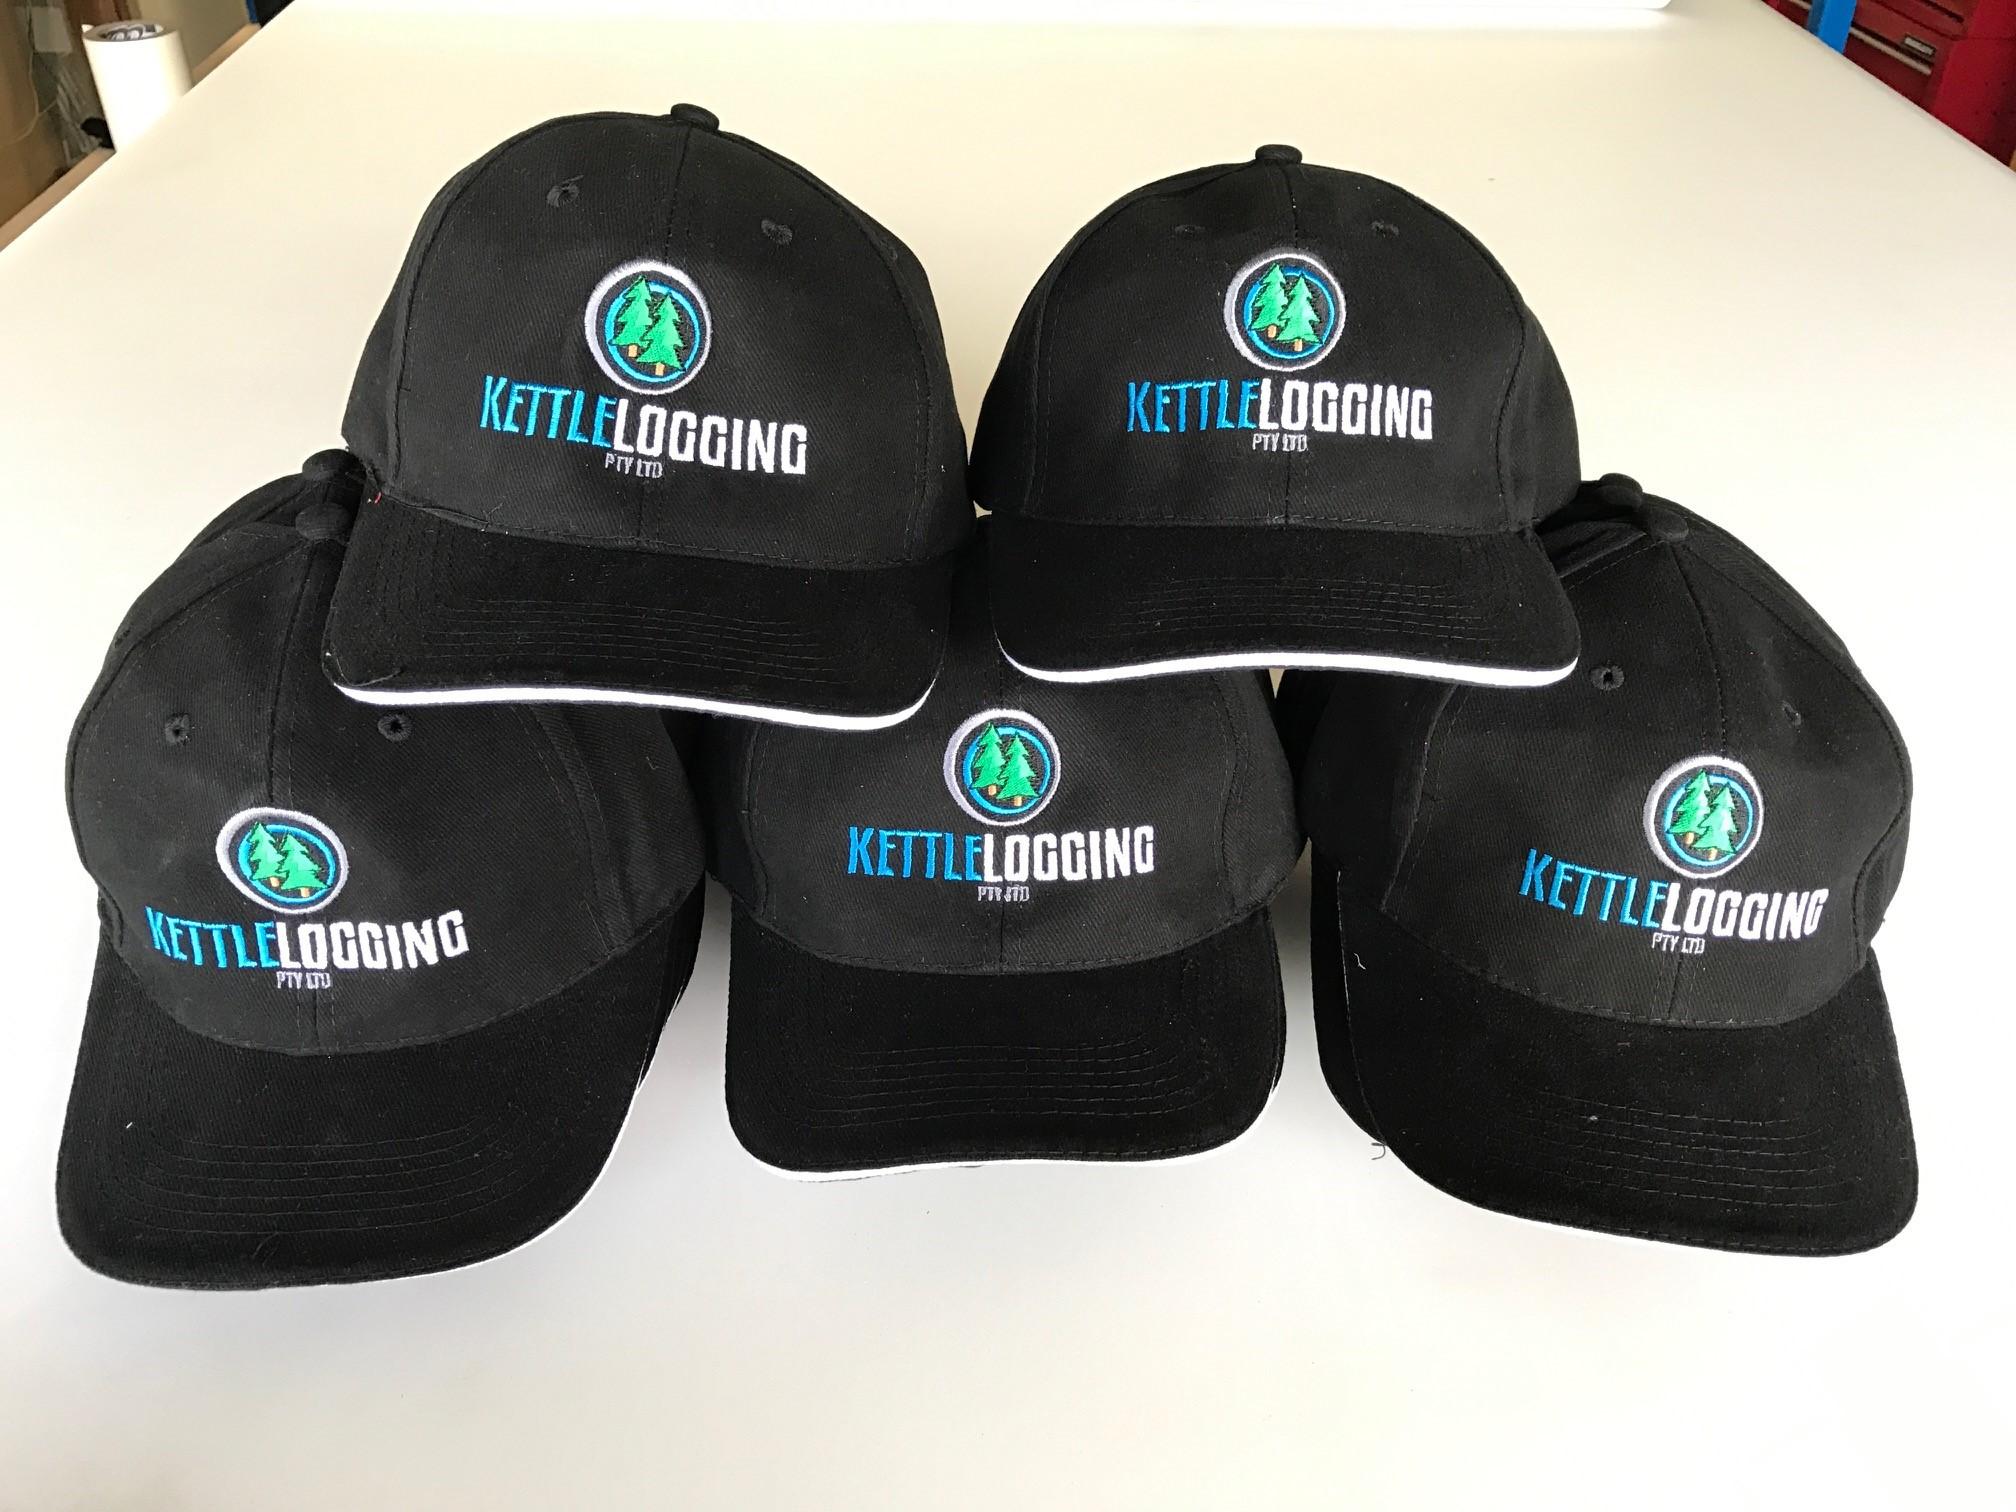 Kettle Logging Caps